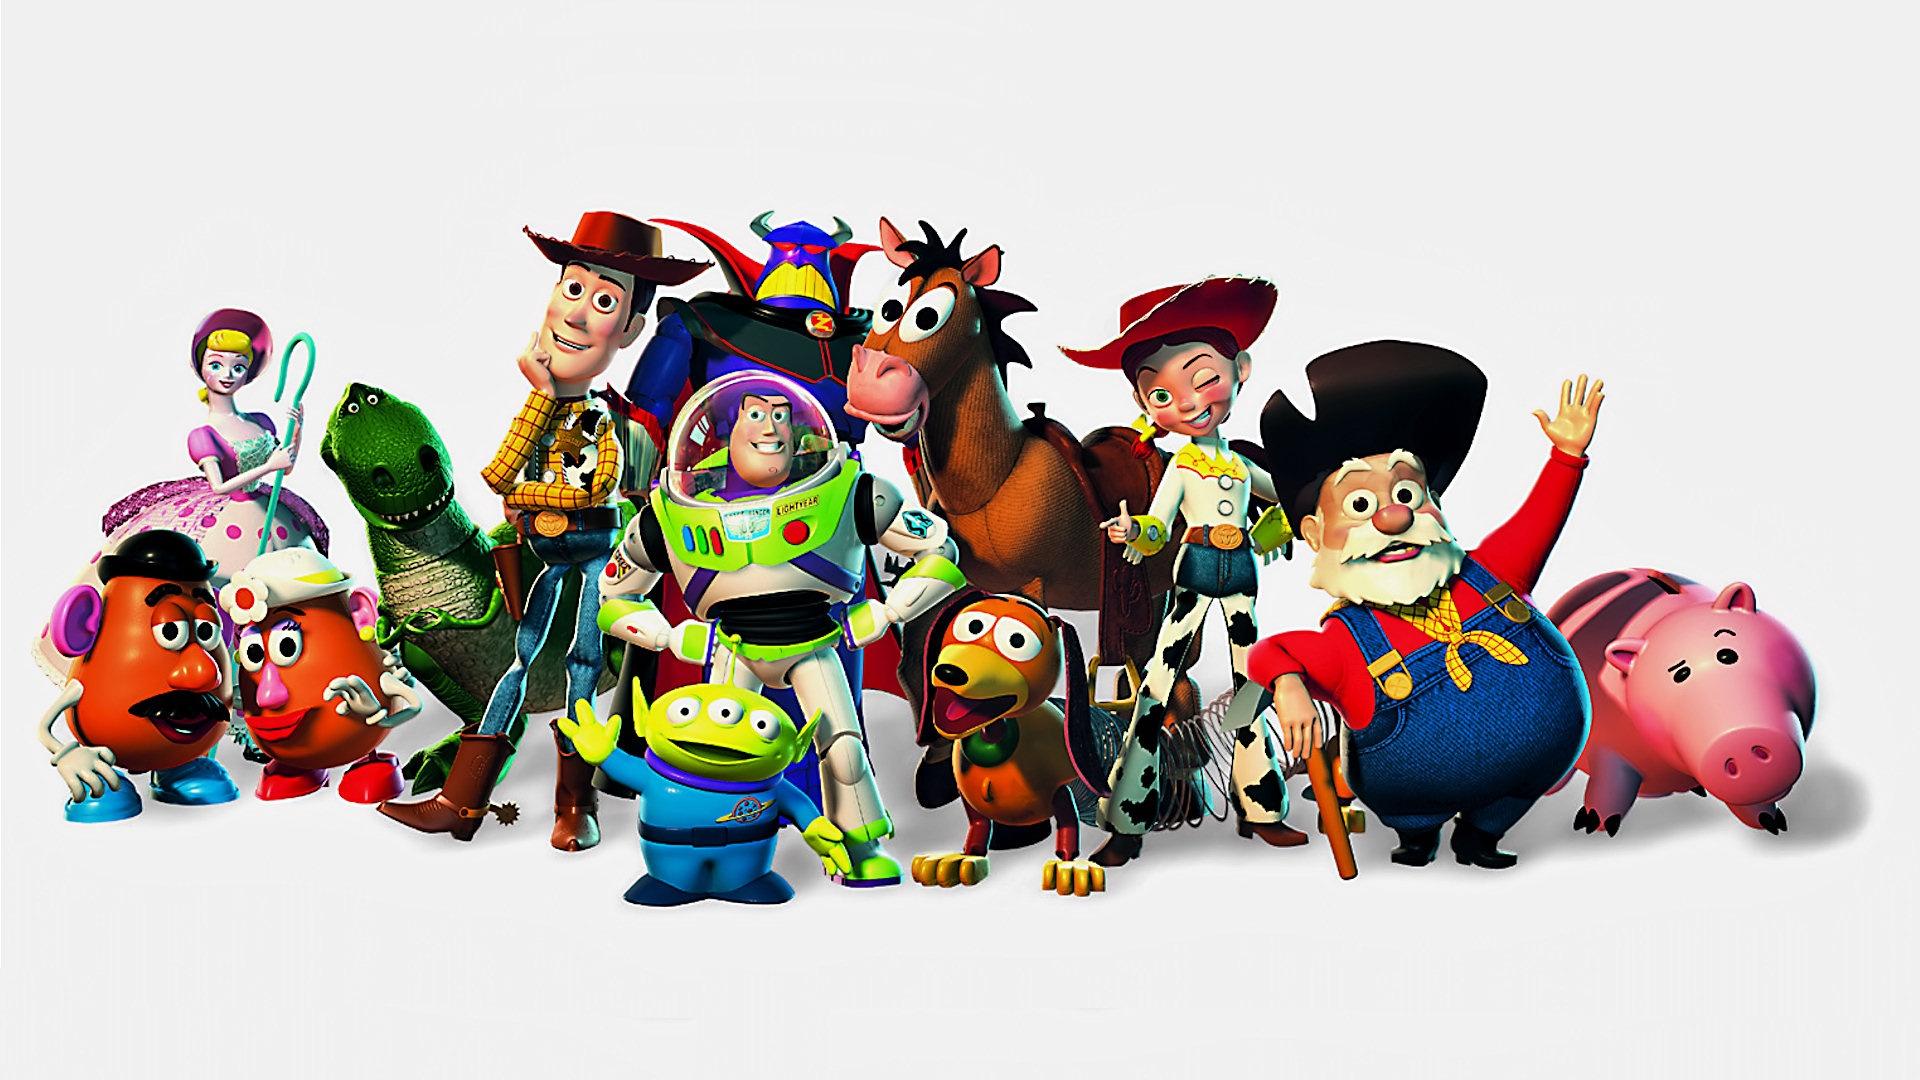 Wreck It Ralph Animation Movie 4k Hd Desktop Wallpaper For: WallpaperSafari